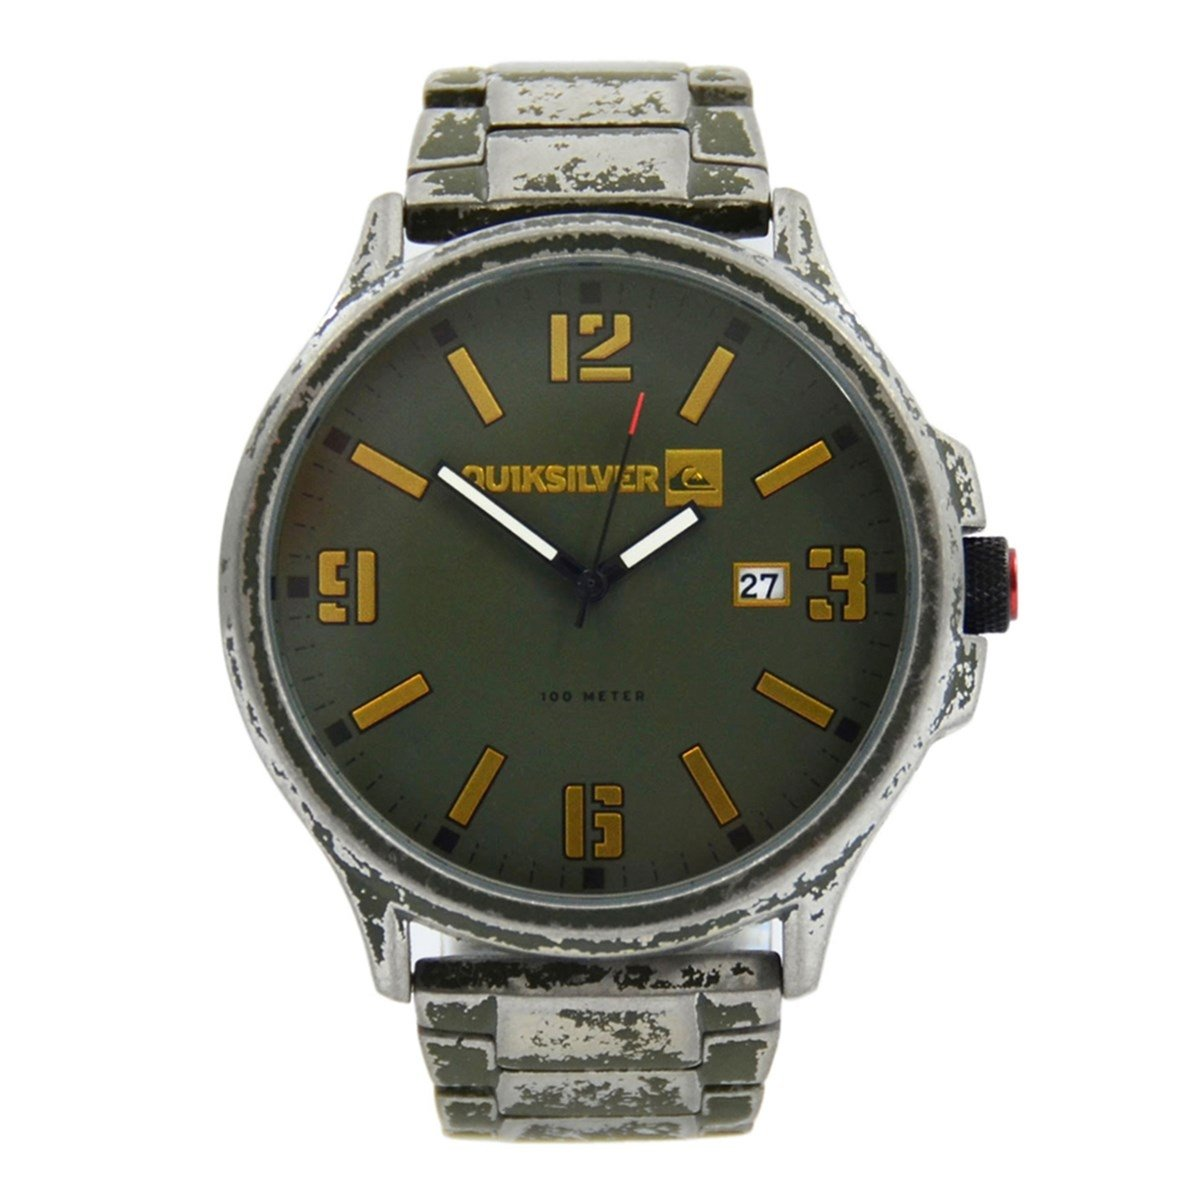 eb94b61ea47 Relógio Quiksilver Beluka Army - Compre Agora